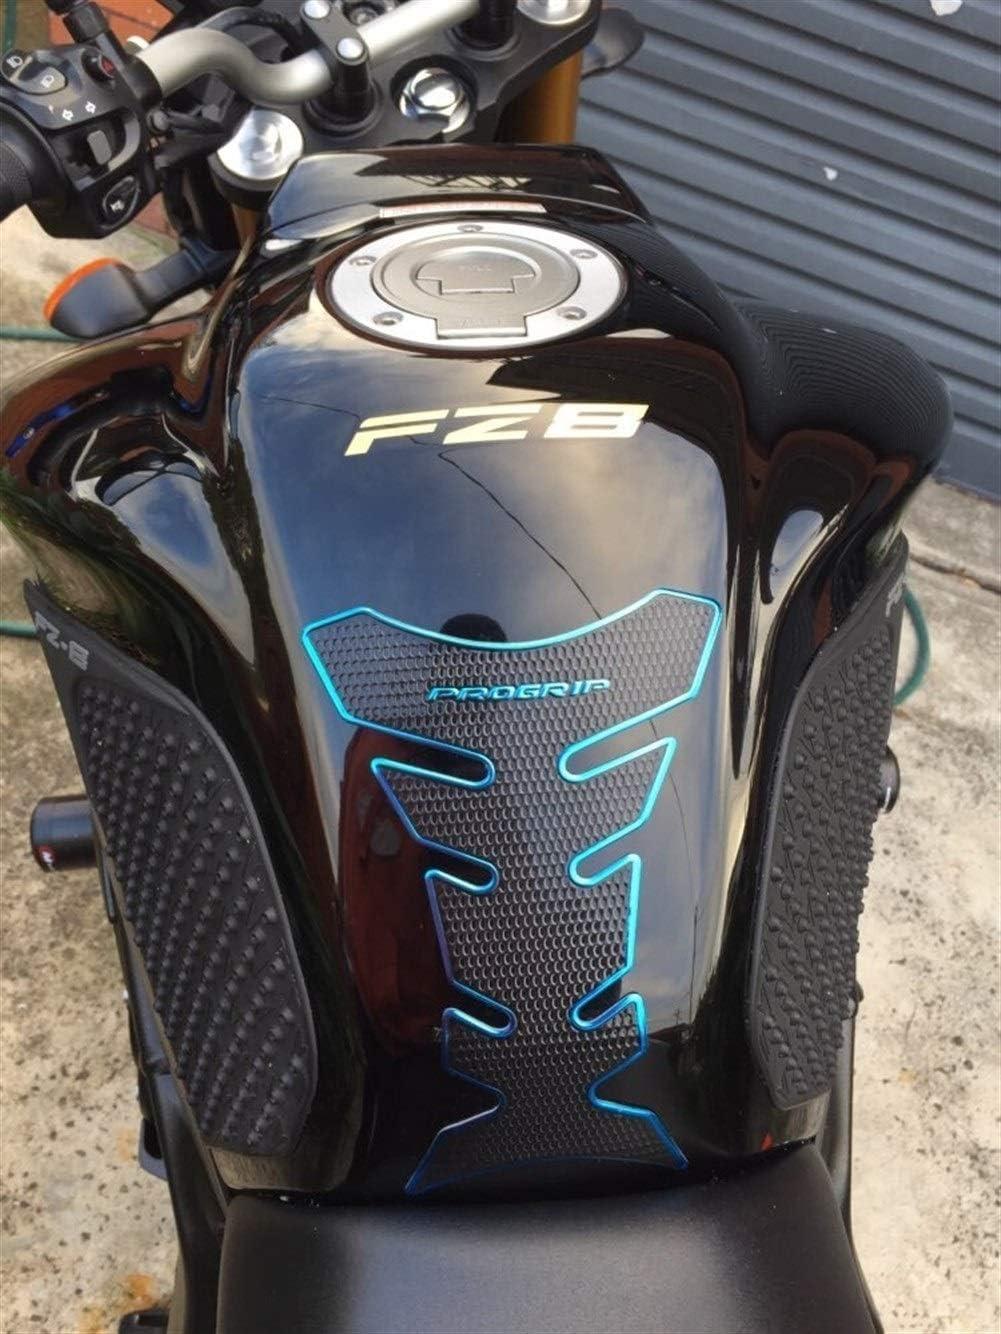 3PC 3D Motorcycle Tank Pad Protector Sticker Case for Honda CBR 600 900 Yamaha MT01 MT03 MT07 MT09 FZ1 FZ6 Kawasaki Z750 Z800 Color : Black